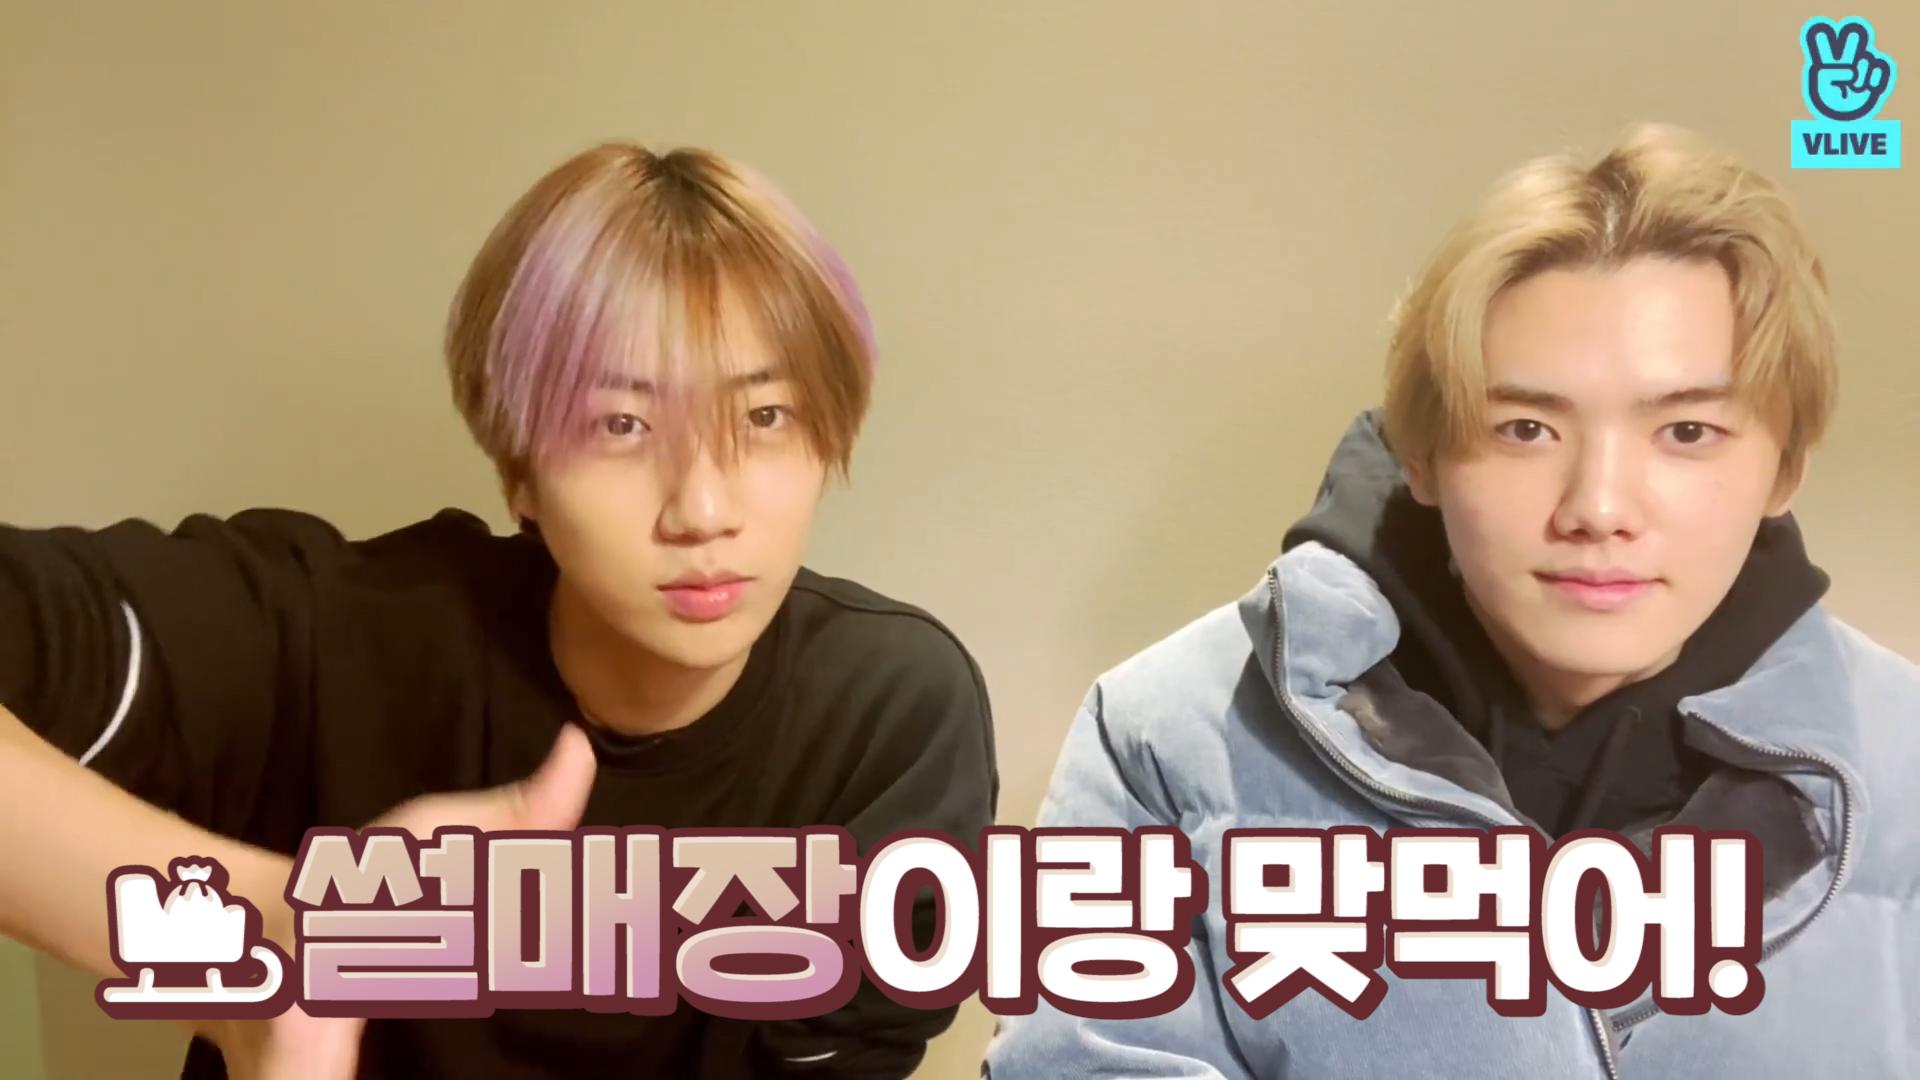 [CRAVITY] 학교 계단이 like 우리비티 콧대.. 스키점프랑 맞먹는..⛷️ (WONJIN&MINHEE talking about their school days)